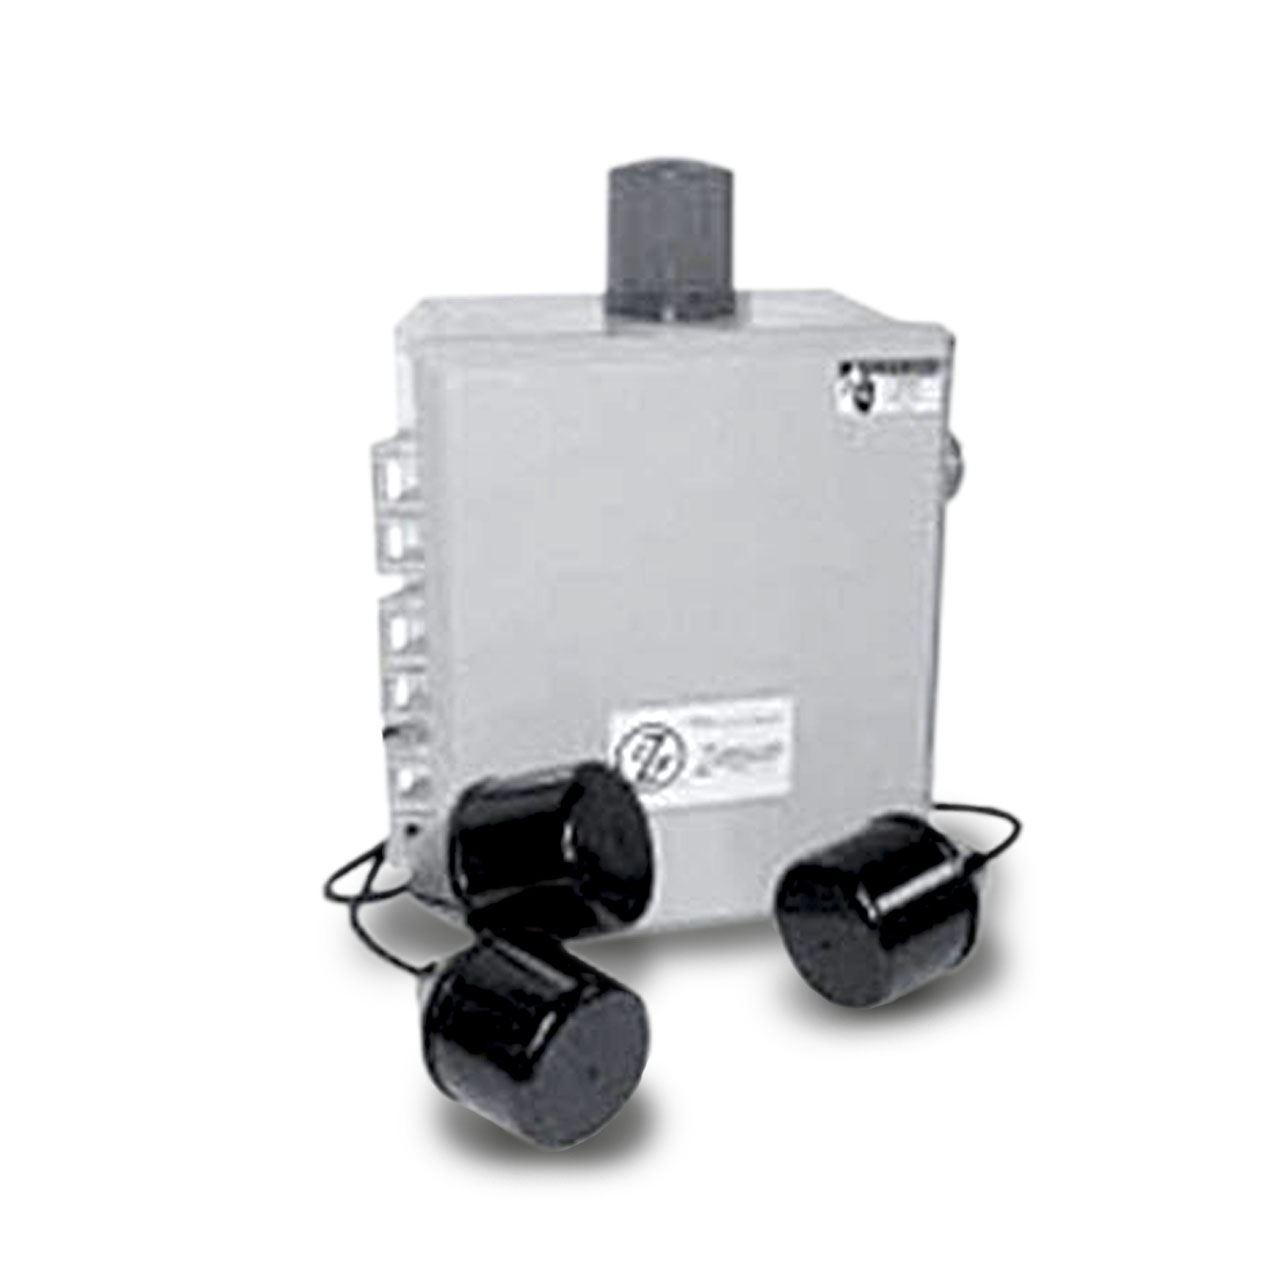 Lead Lag Pump Control Wiring Diagram Smart Electrical Zoeller 100395 Model G840 Shark Panel Auto Rhrcworst